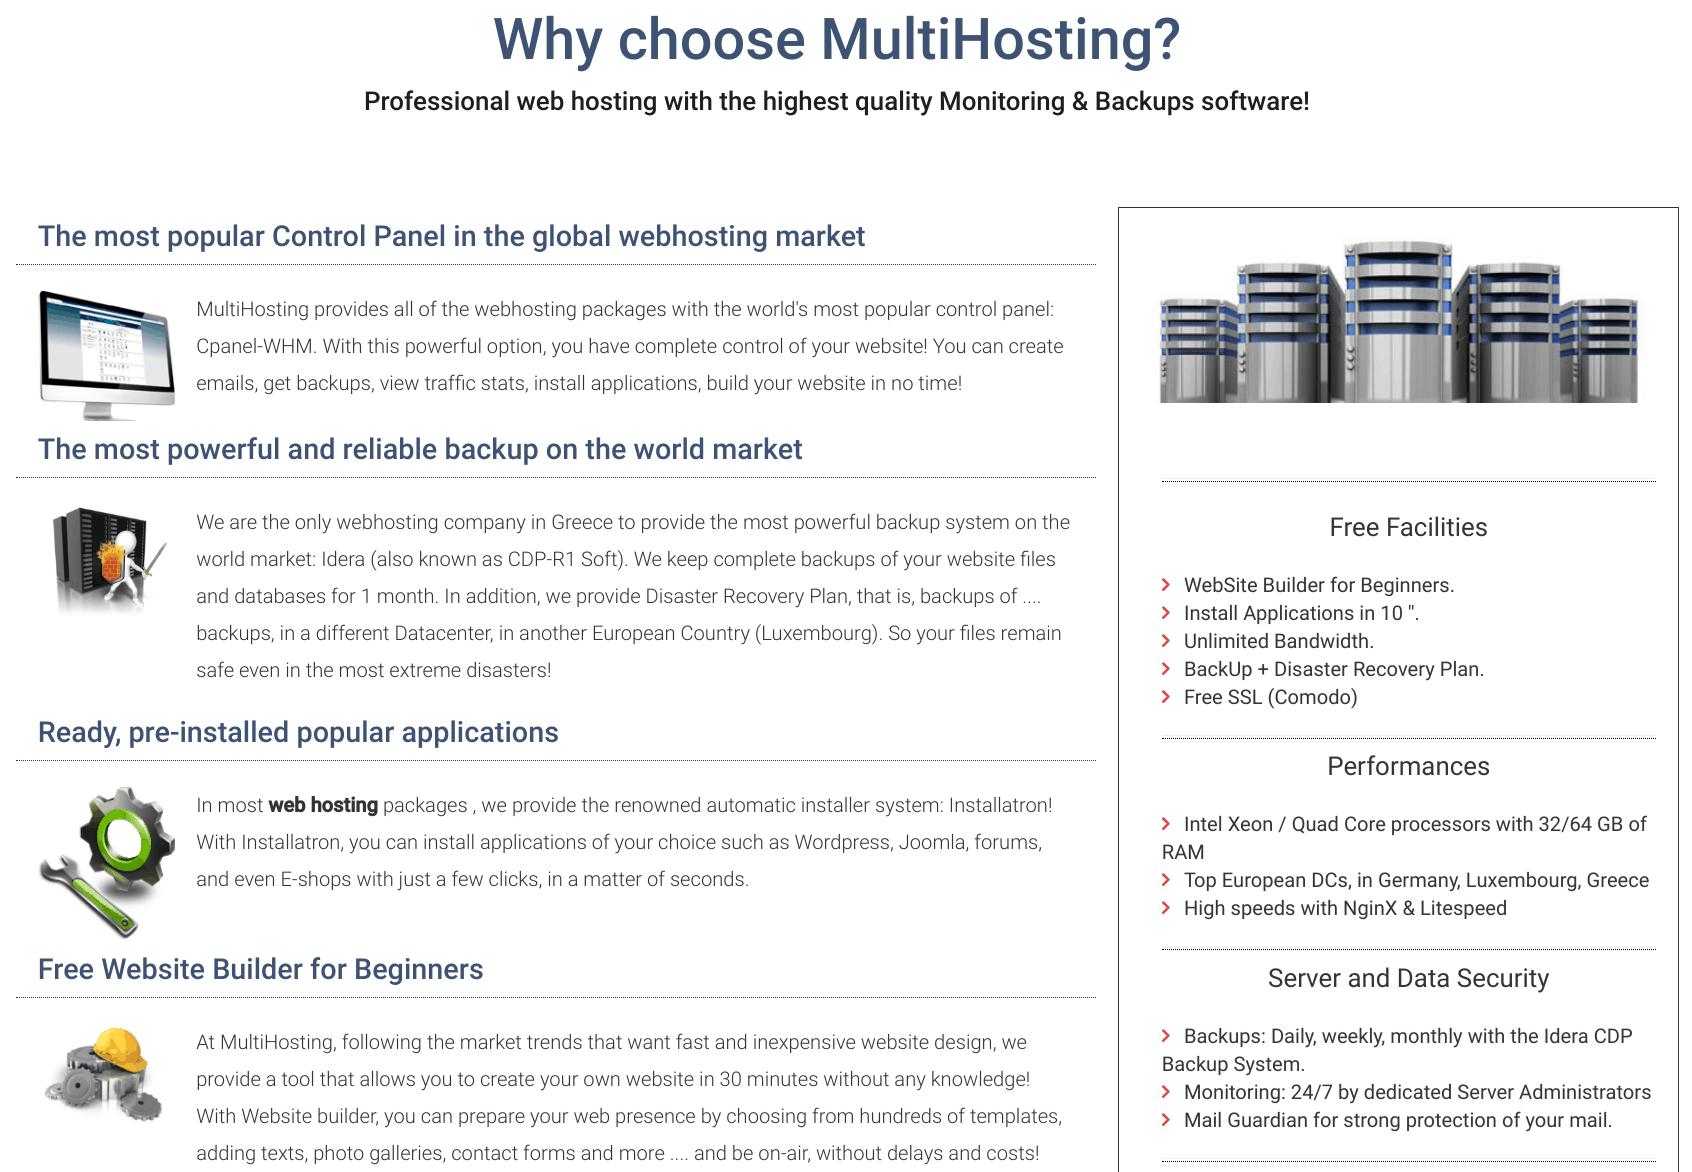 MultiHosting